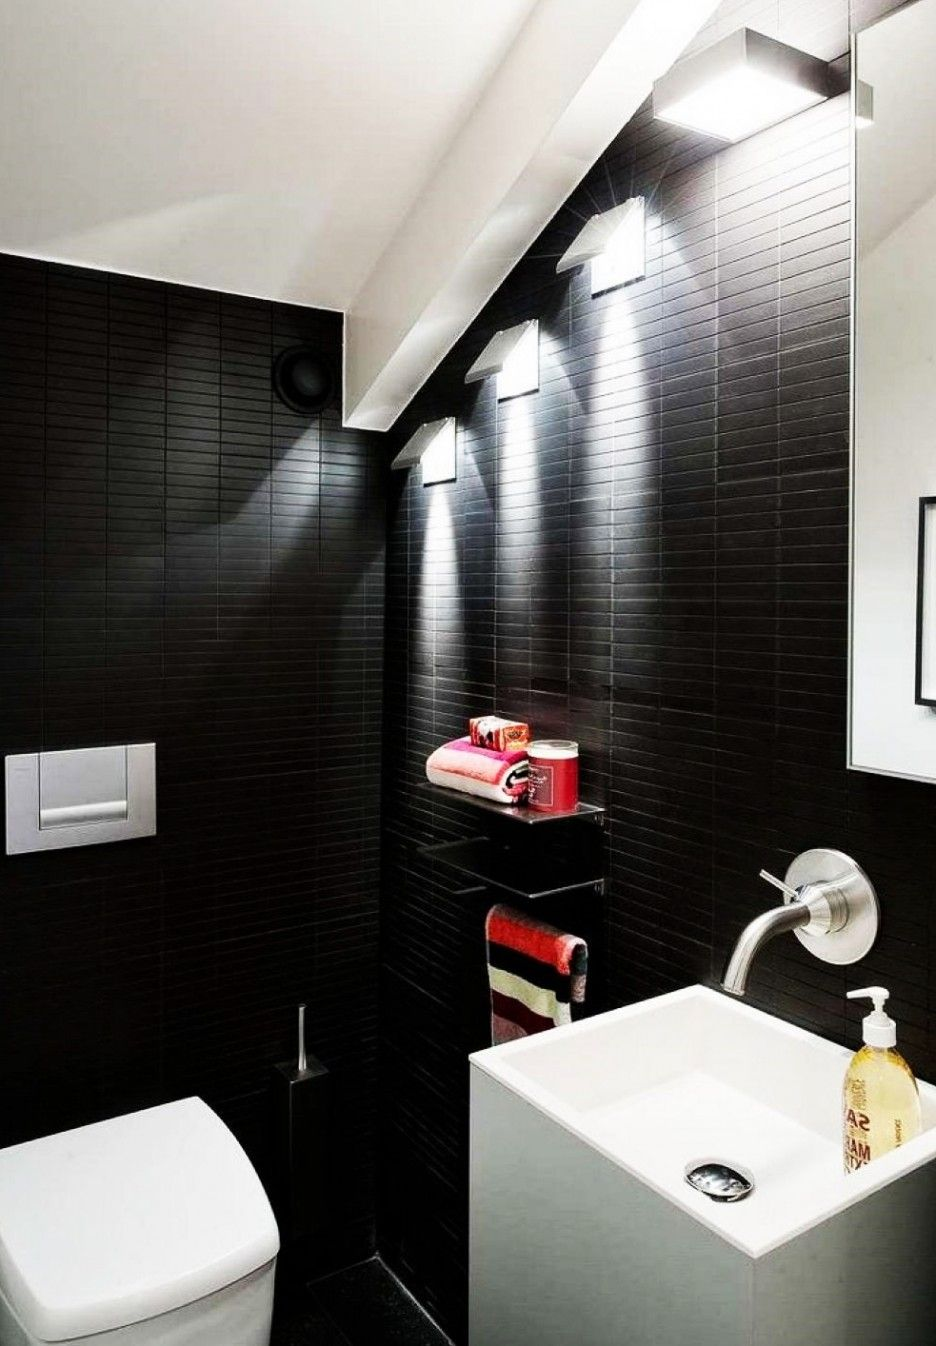 bathroom remarkable bathroom lighting ideas. Bathroom, Remarkable Dramatic Bathroom Wall Lighting Design With Black Color Interior: Ideas Z